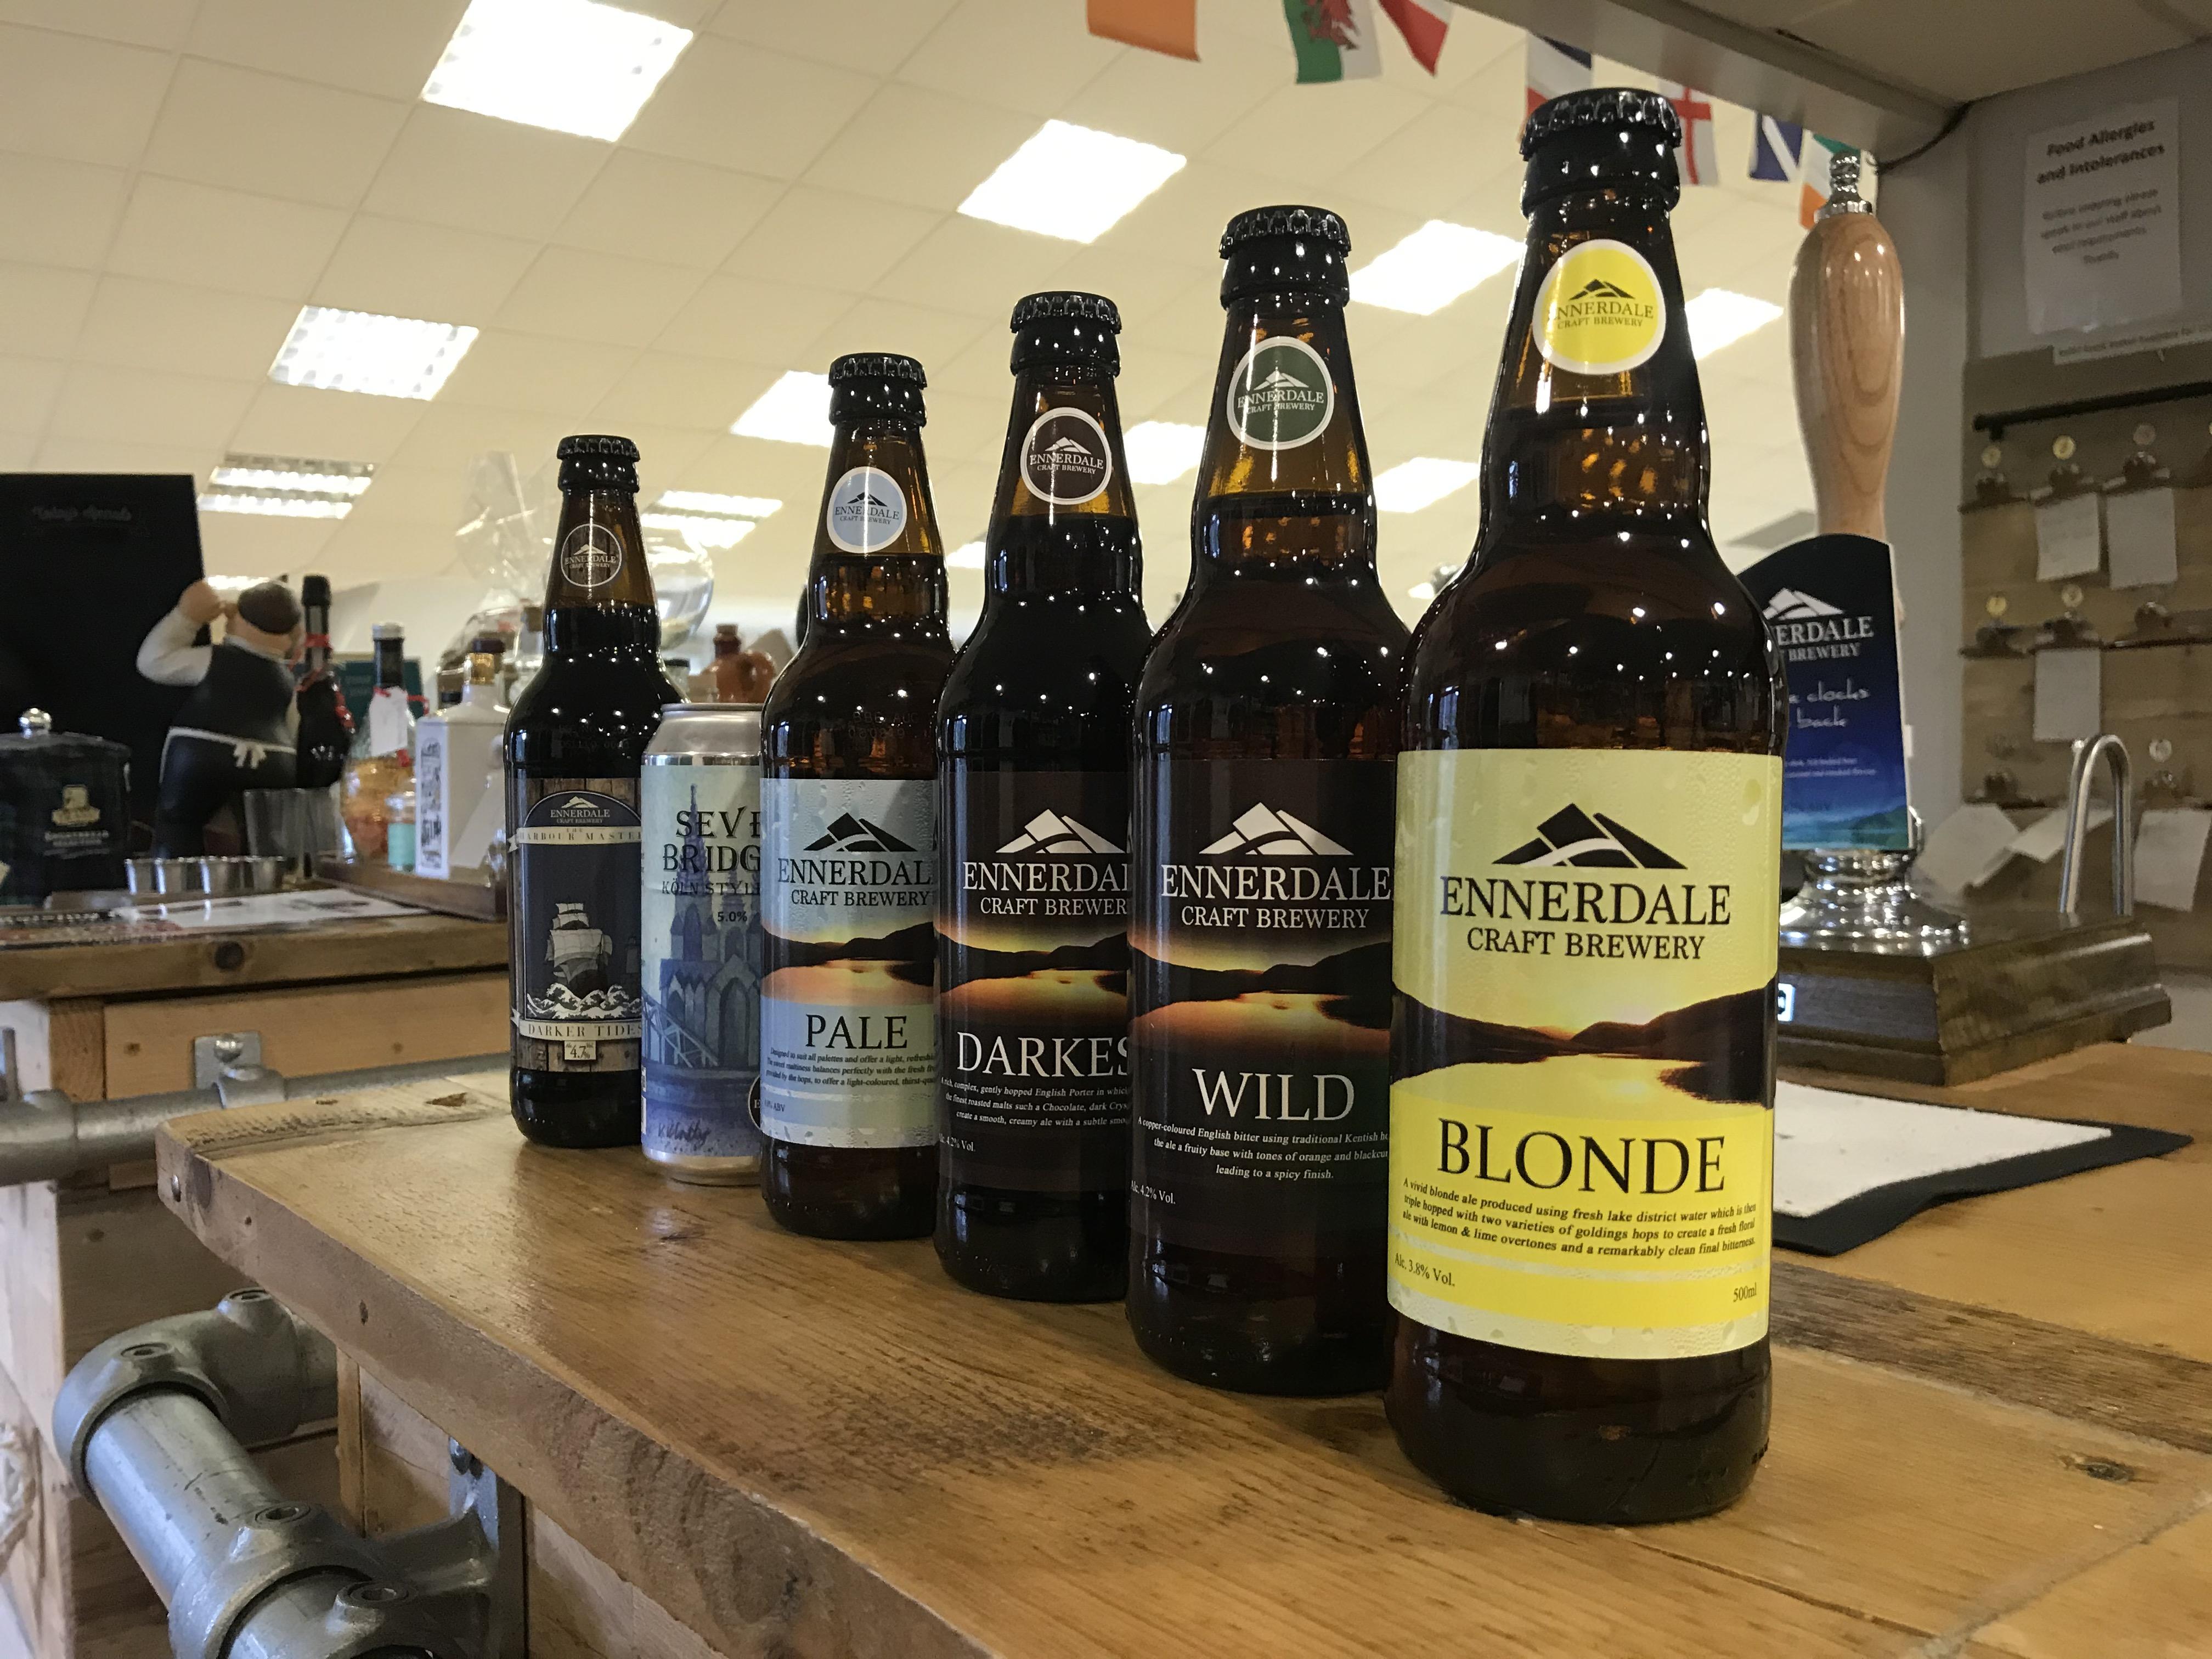 Bottles of beer from Ennerdale Craft Brewery